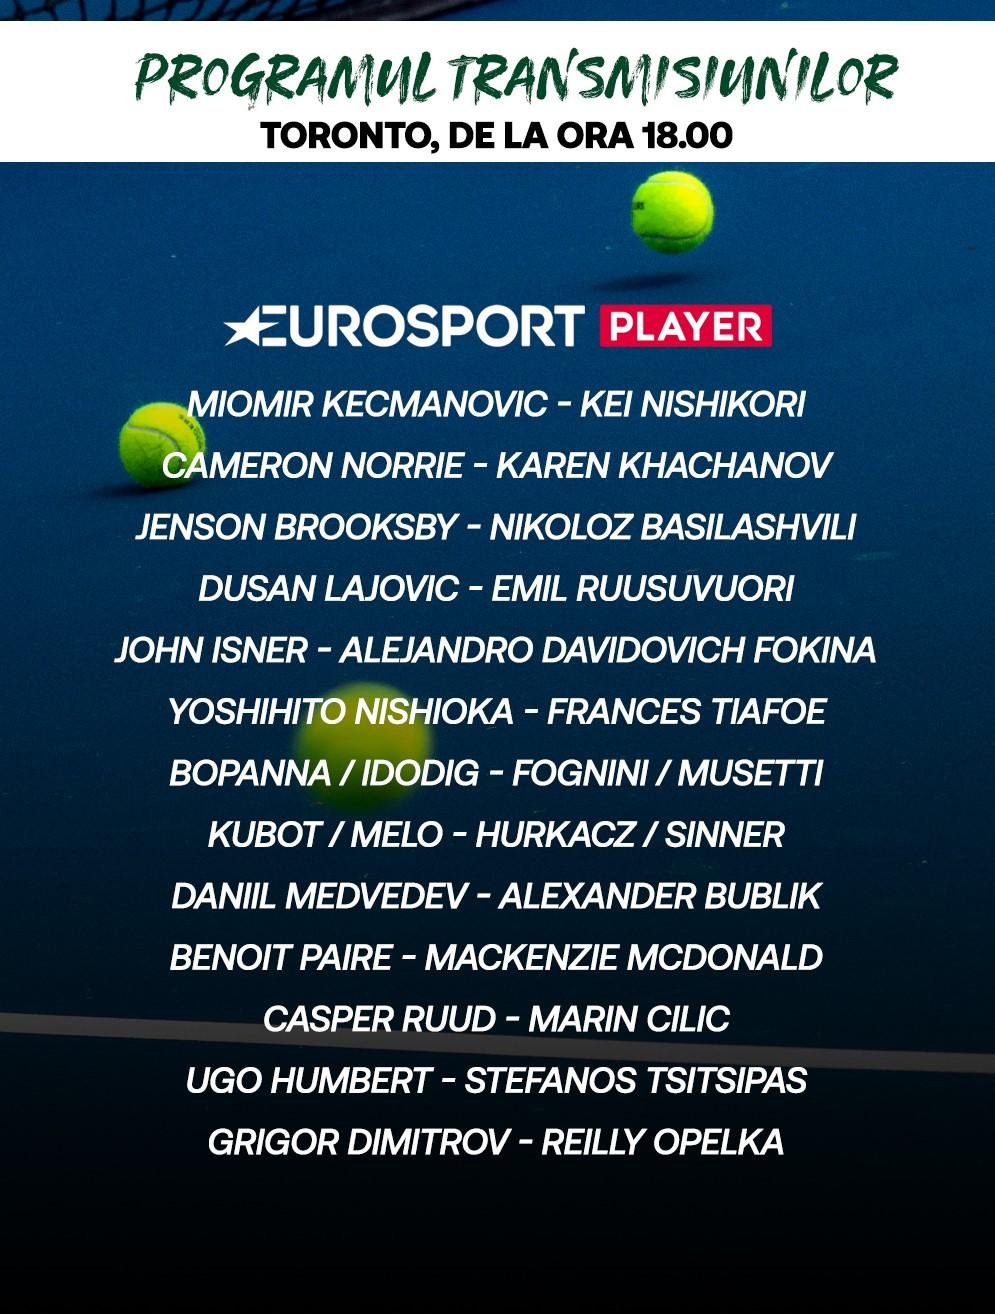 https://i.eurosport.com/2021/08/10/3199339.jpg